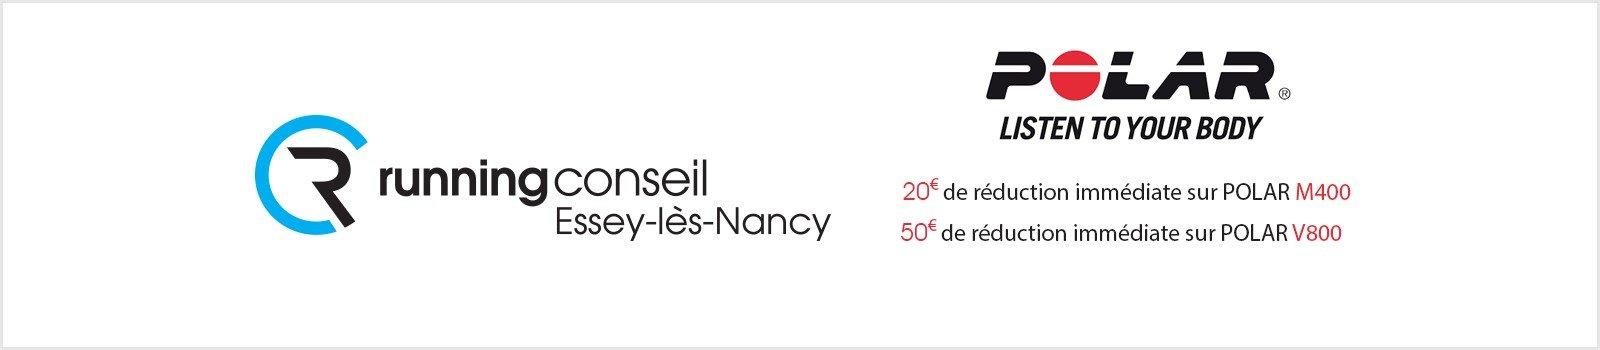 OFFRE POLAR RUNNING CONSEIL Essey-les-nancy